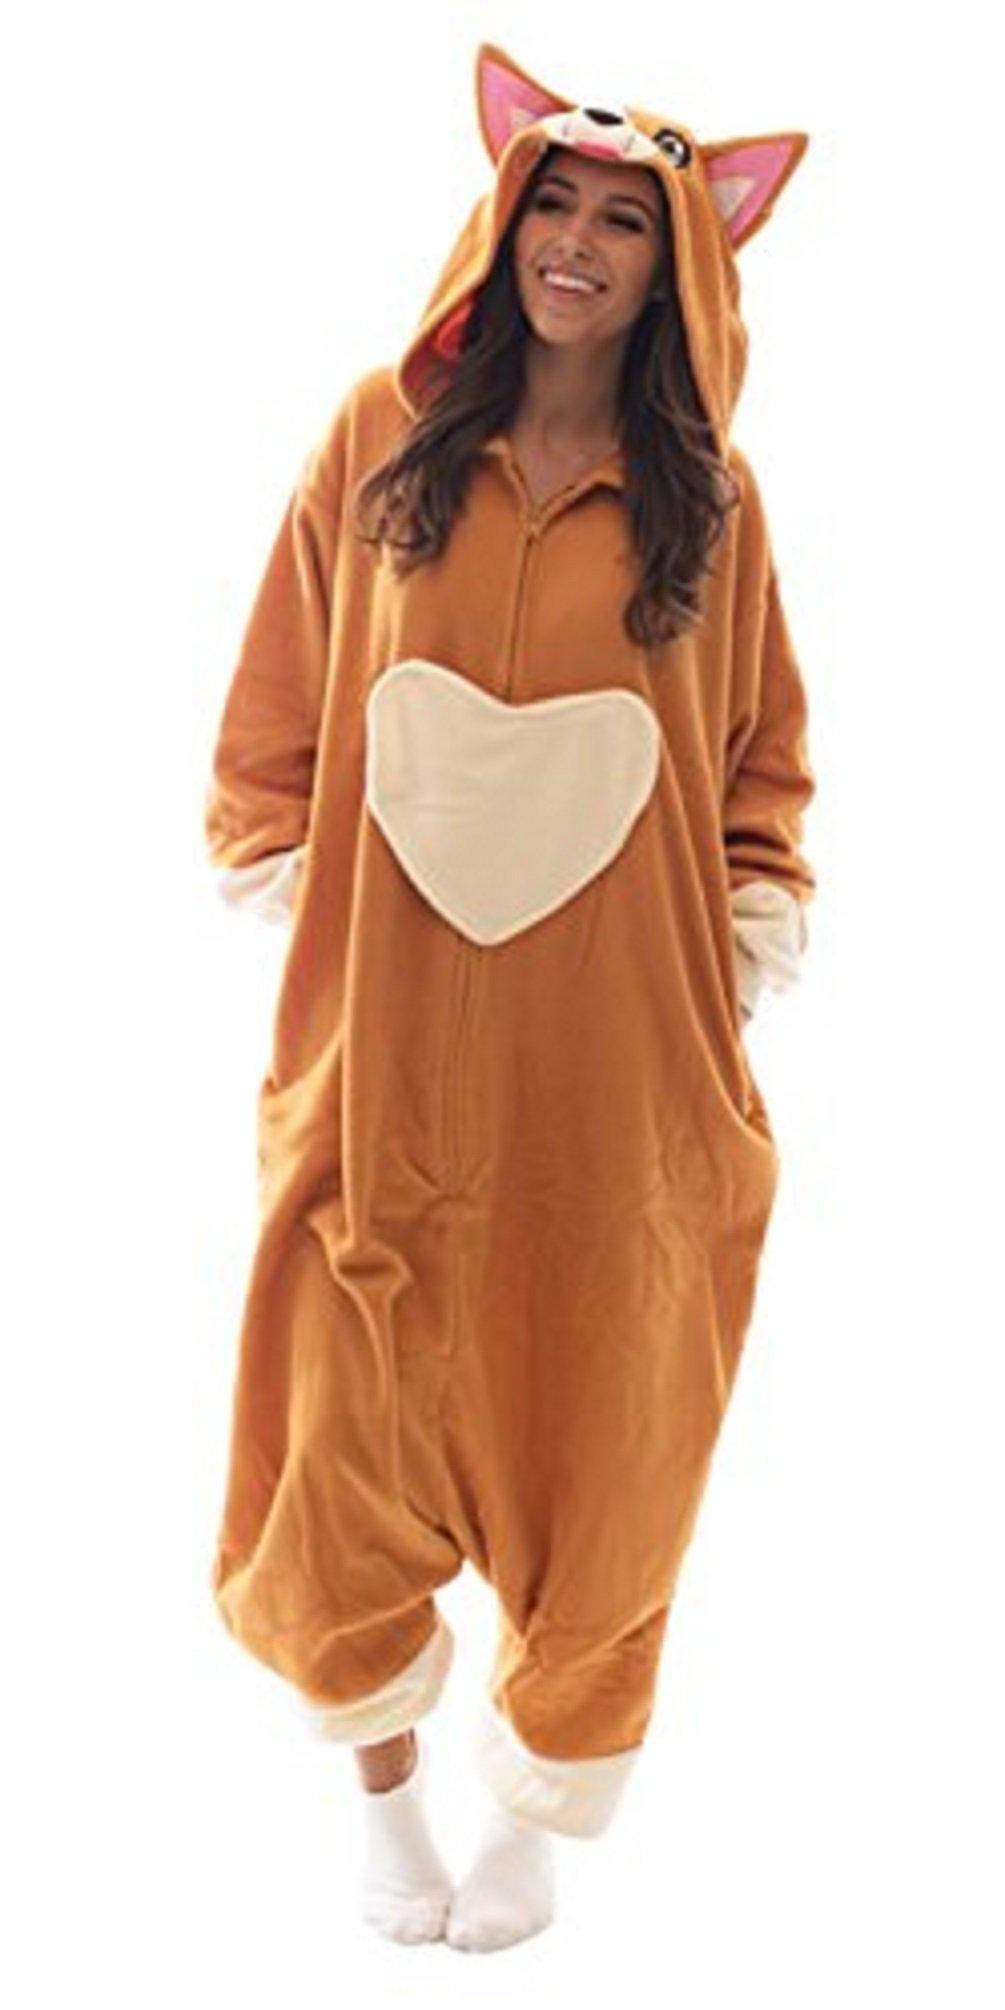 Bad Bear Brand Adult Onesie Corgi Animal Pajamas Comfortable Costume with Zipper and Pockets (Large)